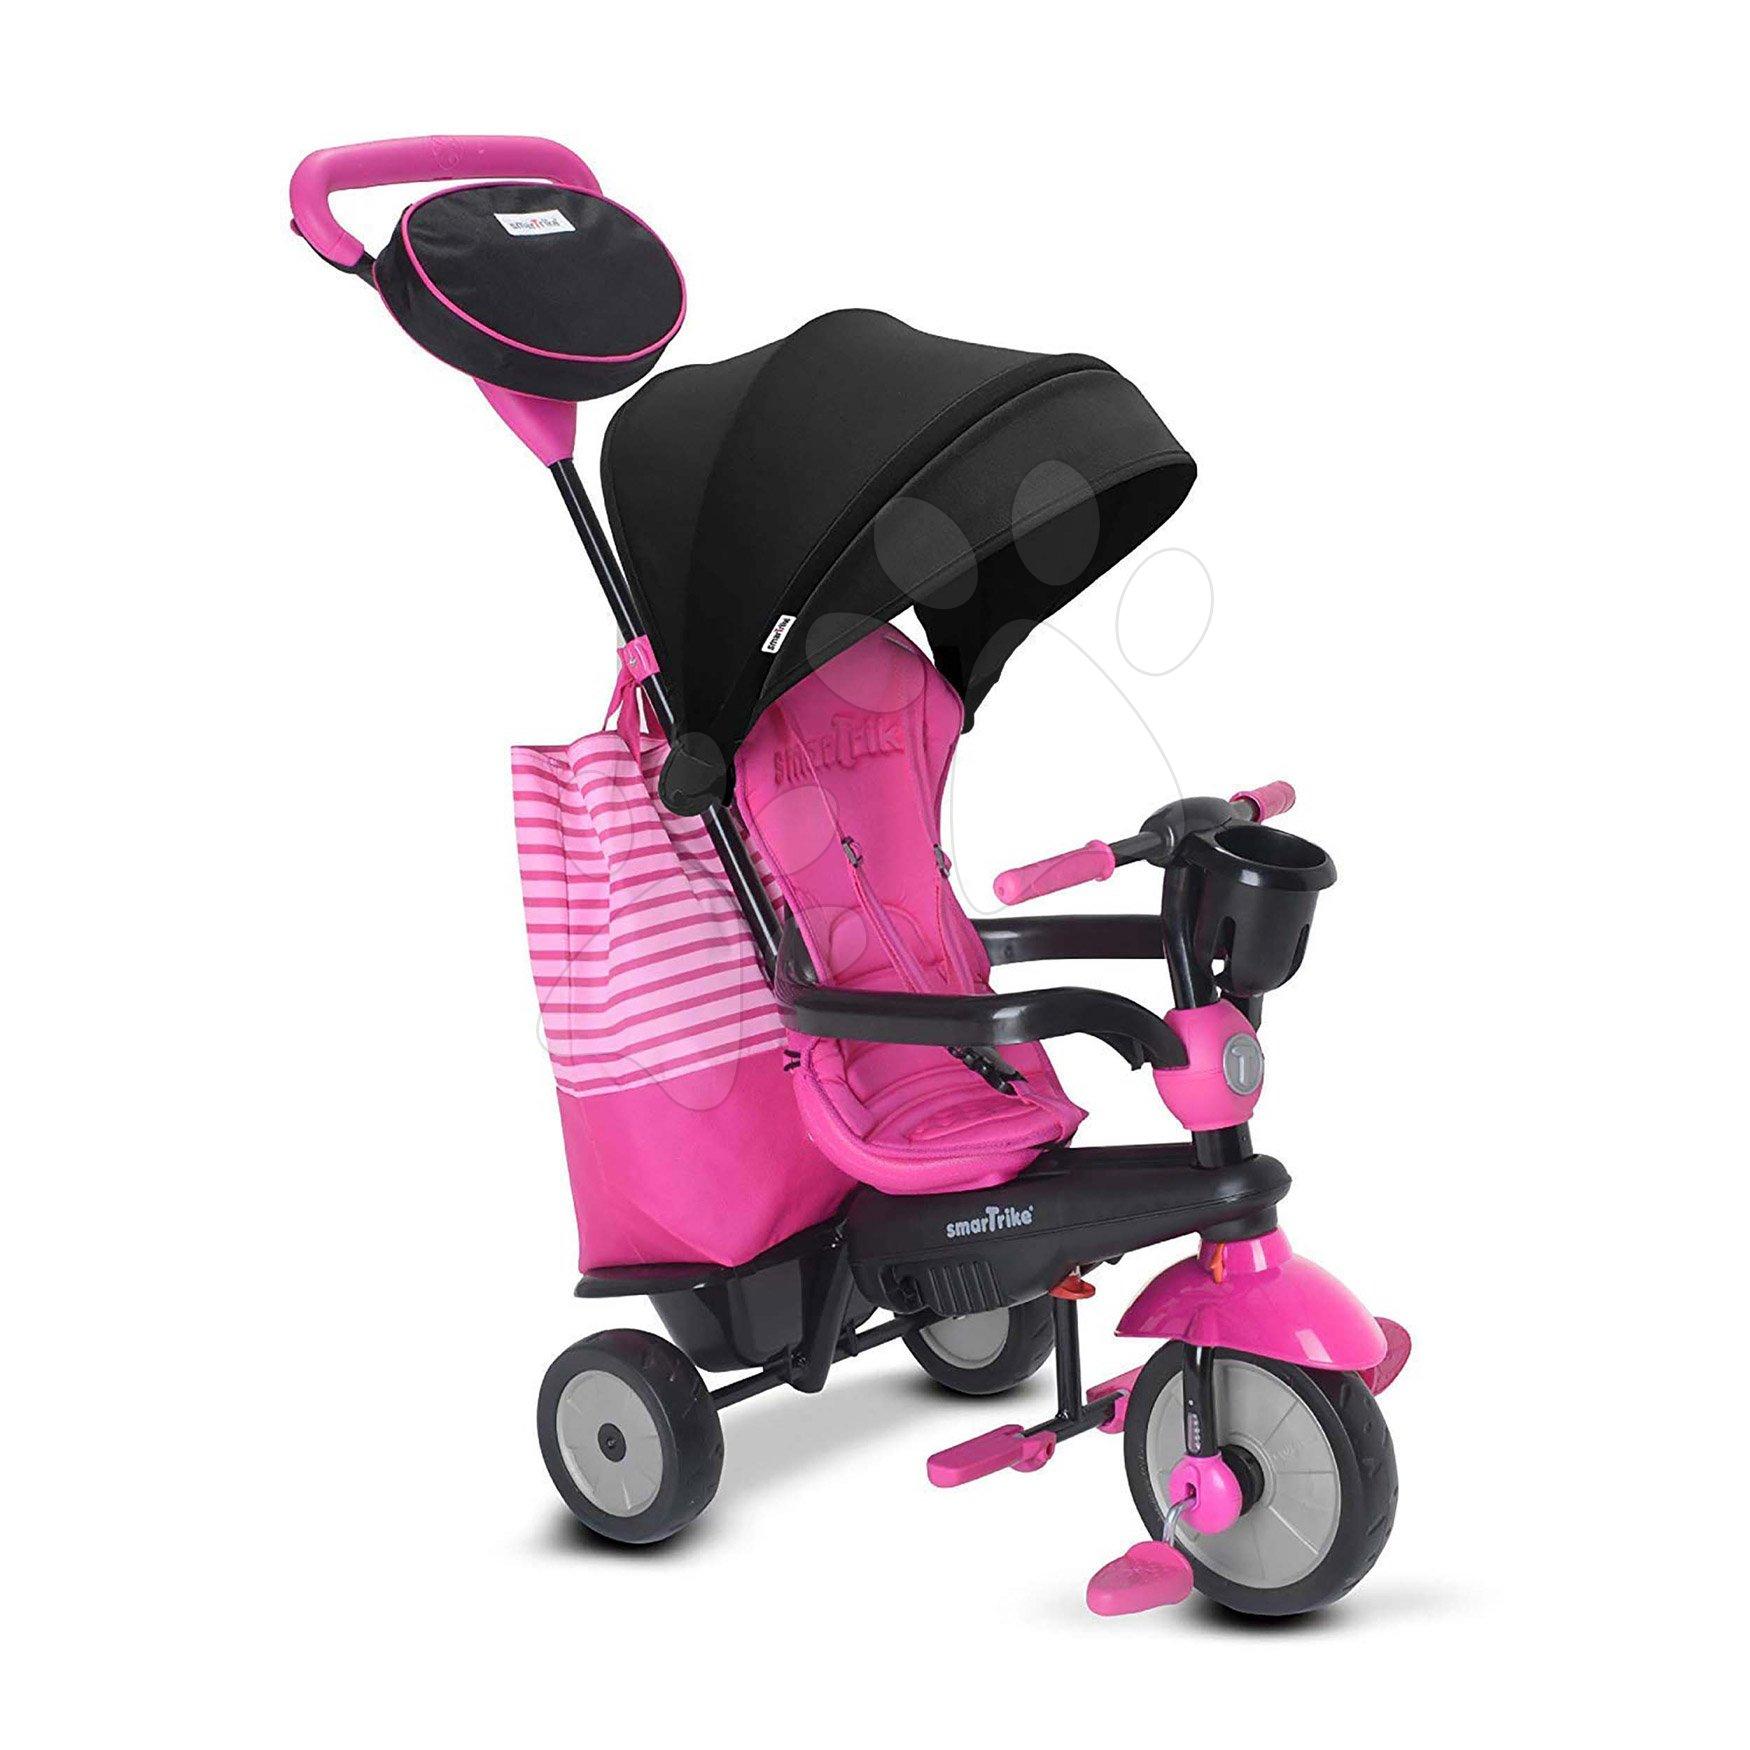 Trojkolka SWING DLX 4v1 Pink TouchSteering smarTrike s tlmičom a voľnobehom + UV filter ružová od 10 mes